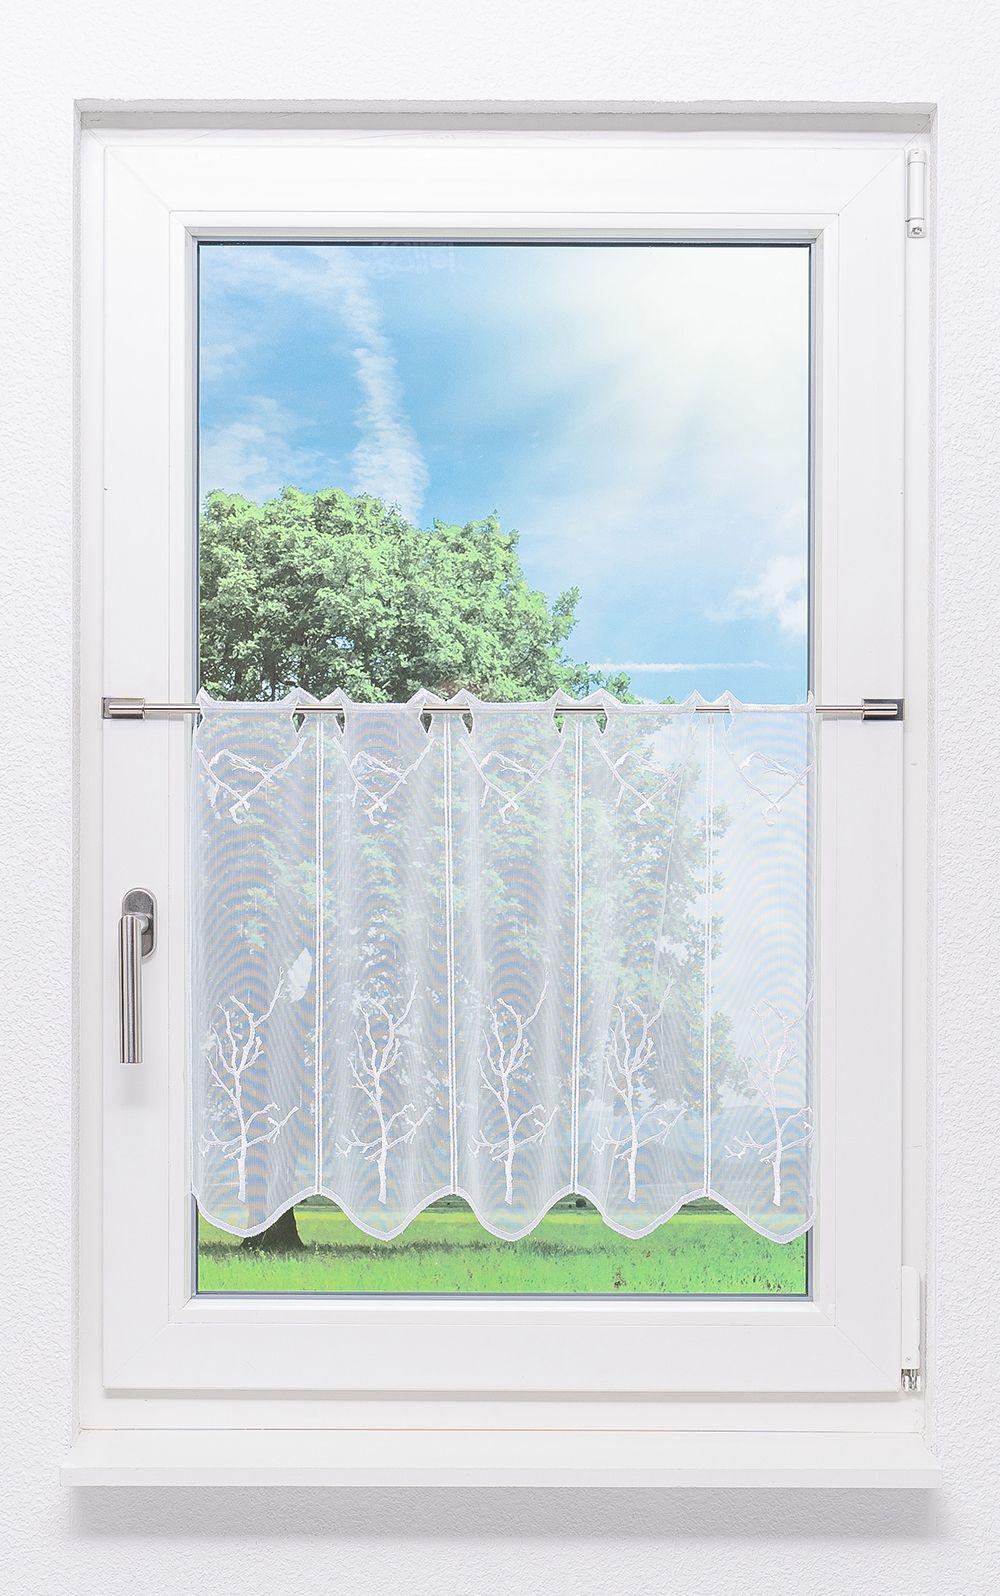 plauener spitze scheibengardinen baum wei ebay. Black Bedroom Furniture Sets. Home Design Ideas